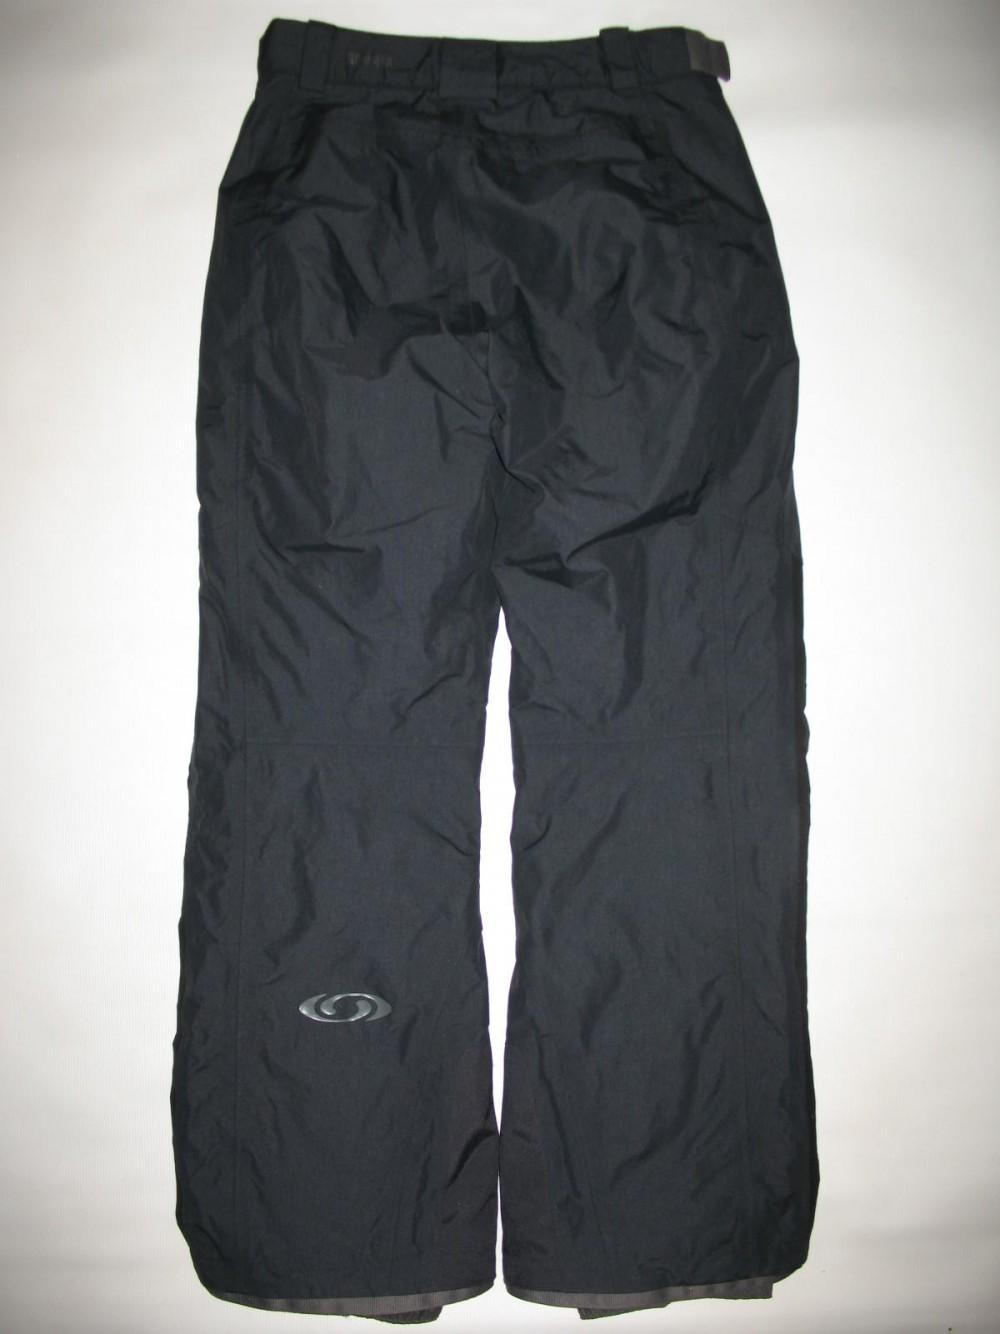 Штаны SALOMON gore-tex ski pants lady (размер 38-M) - 1